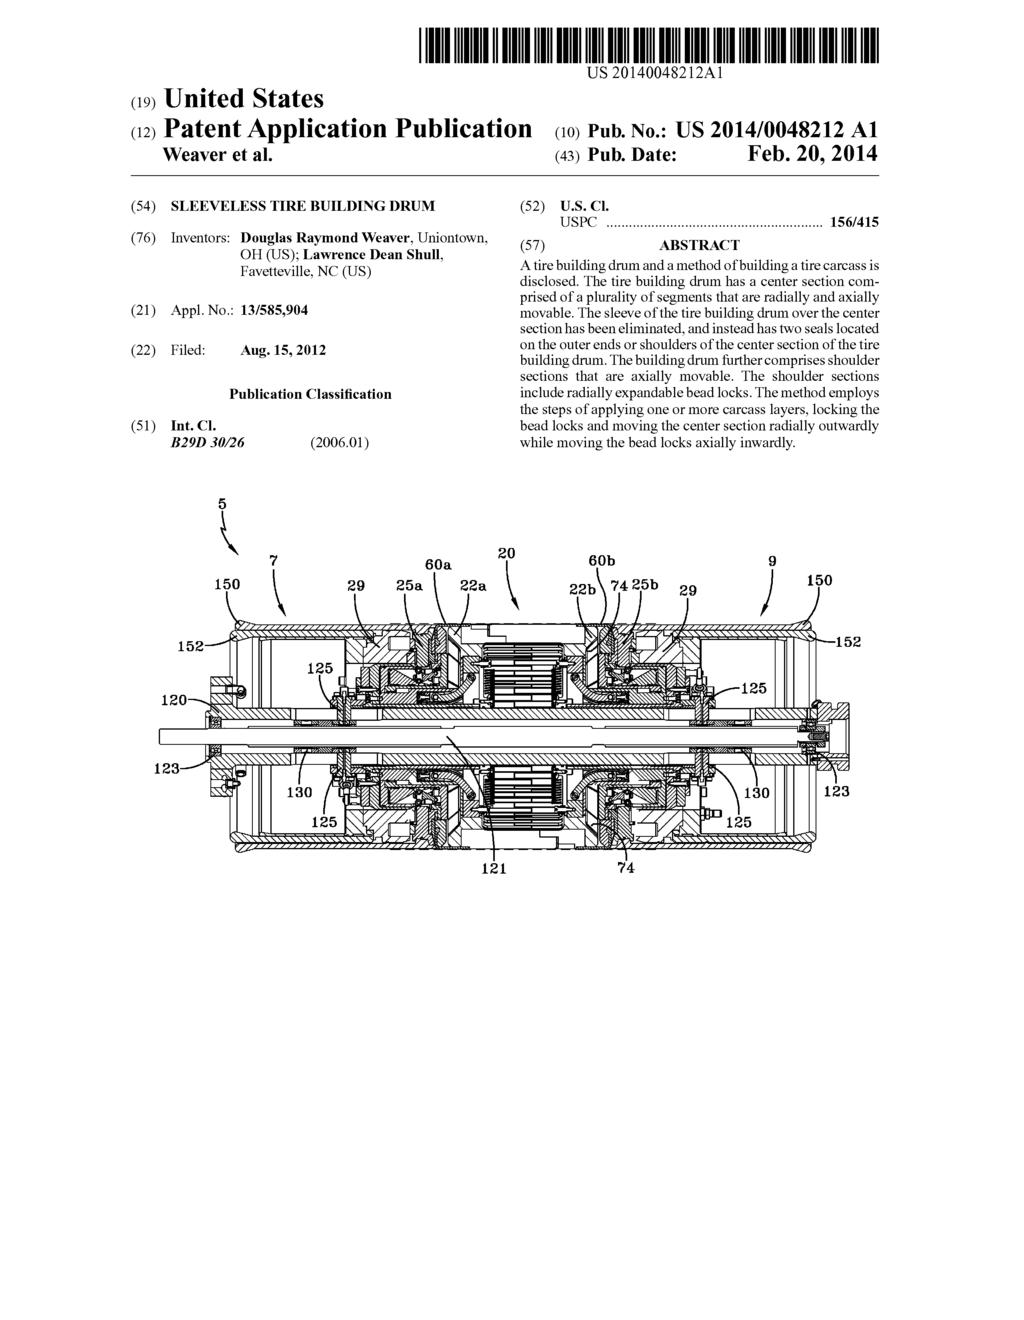 sleeveless tire building drum diagram schematic and image 01 rh patentsencyclopedia com